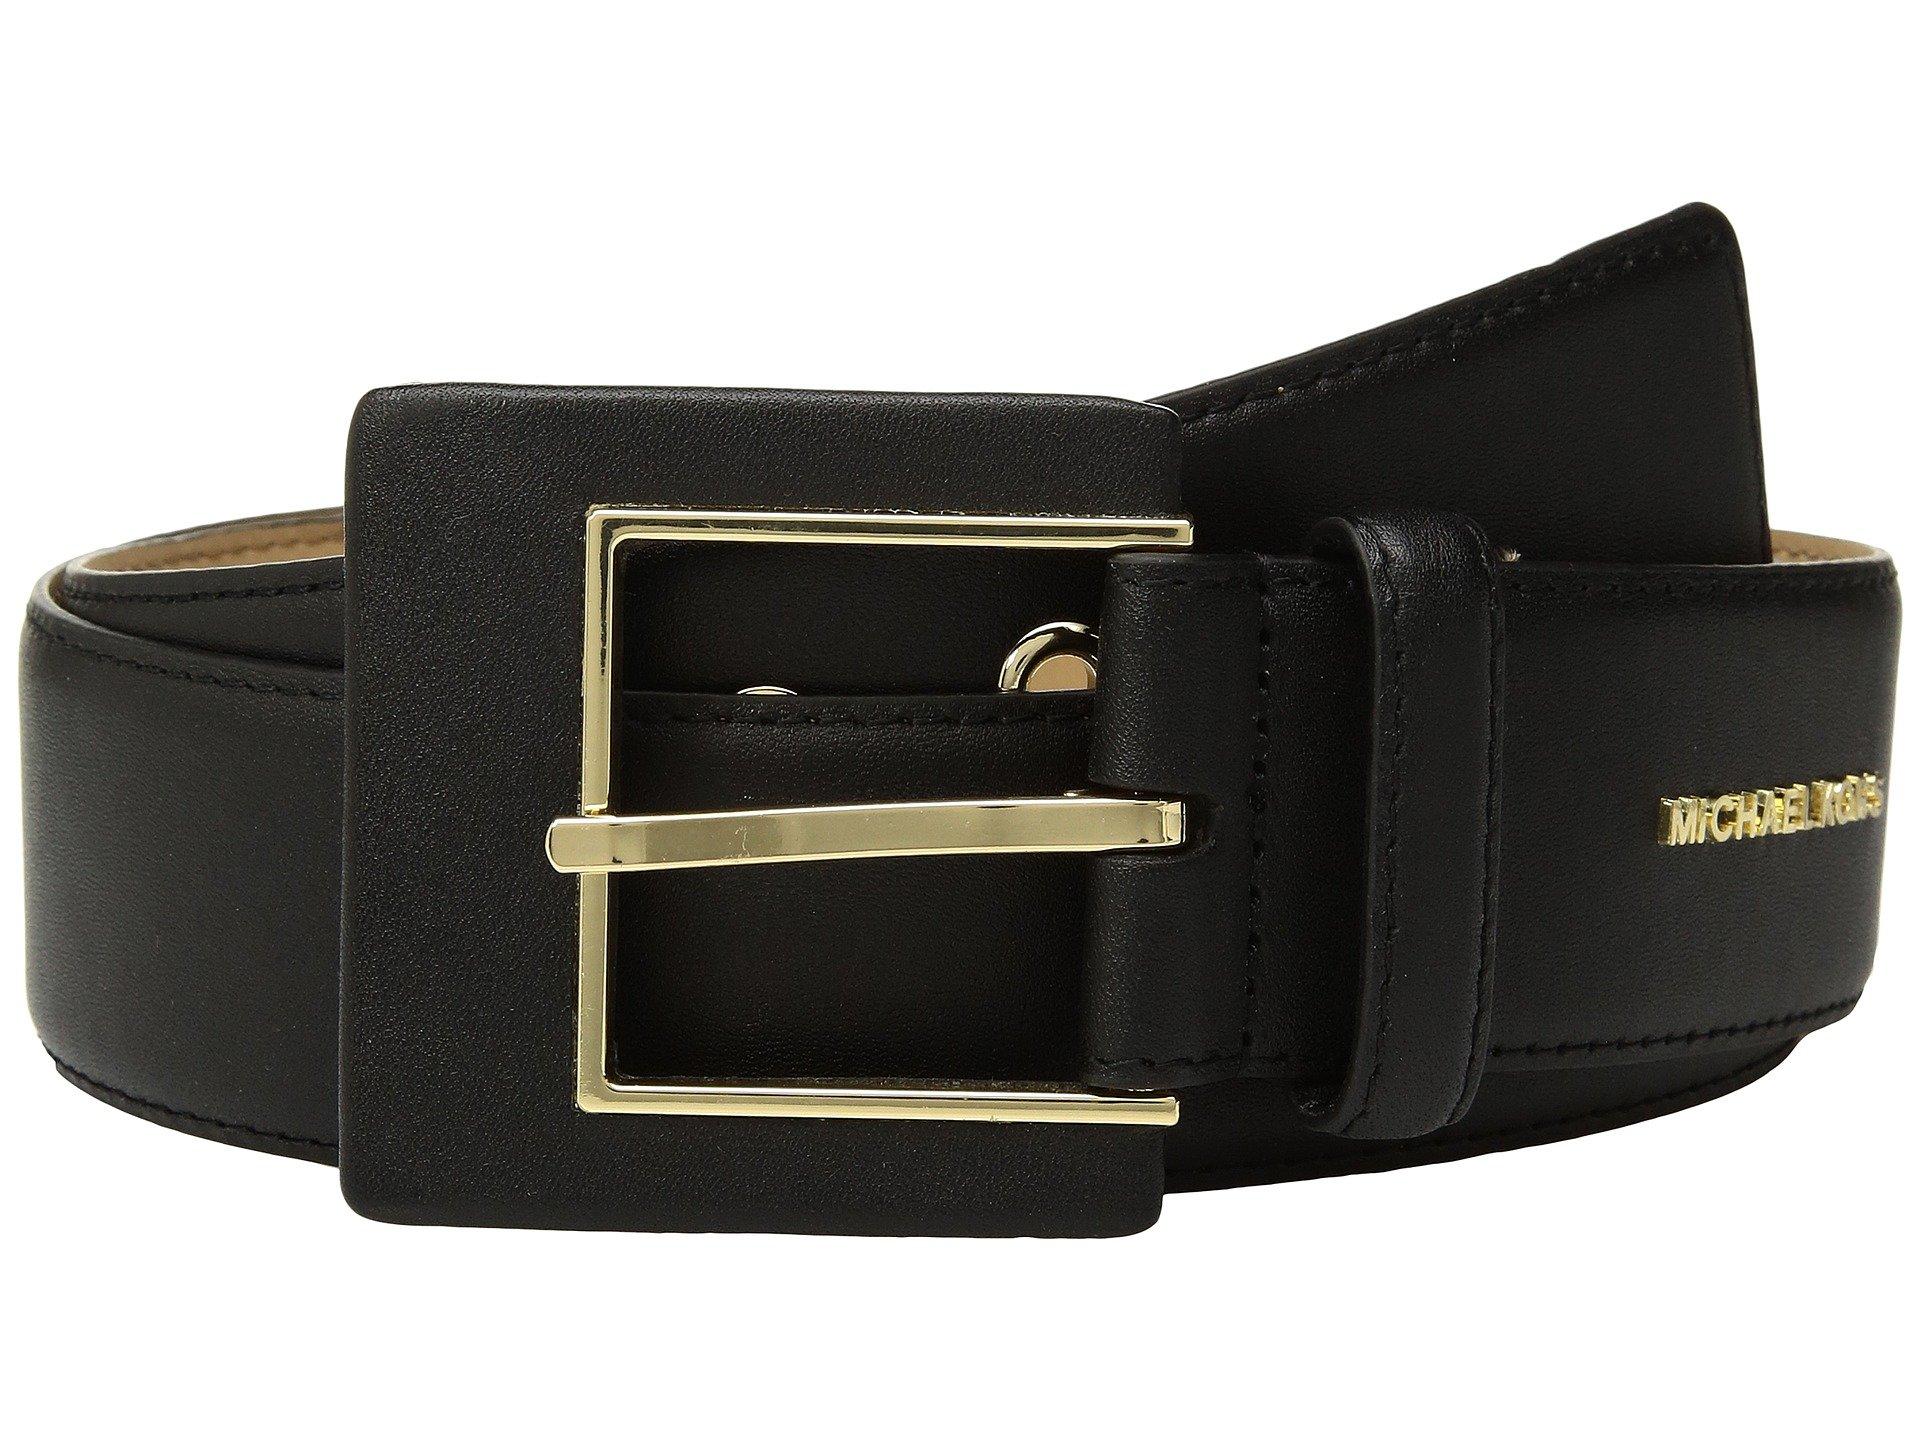 Correa o Cinturon para Mujer MICHAEL Michael Kors Hip Station Belt  + Michael Kors en VeoyCompro.net